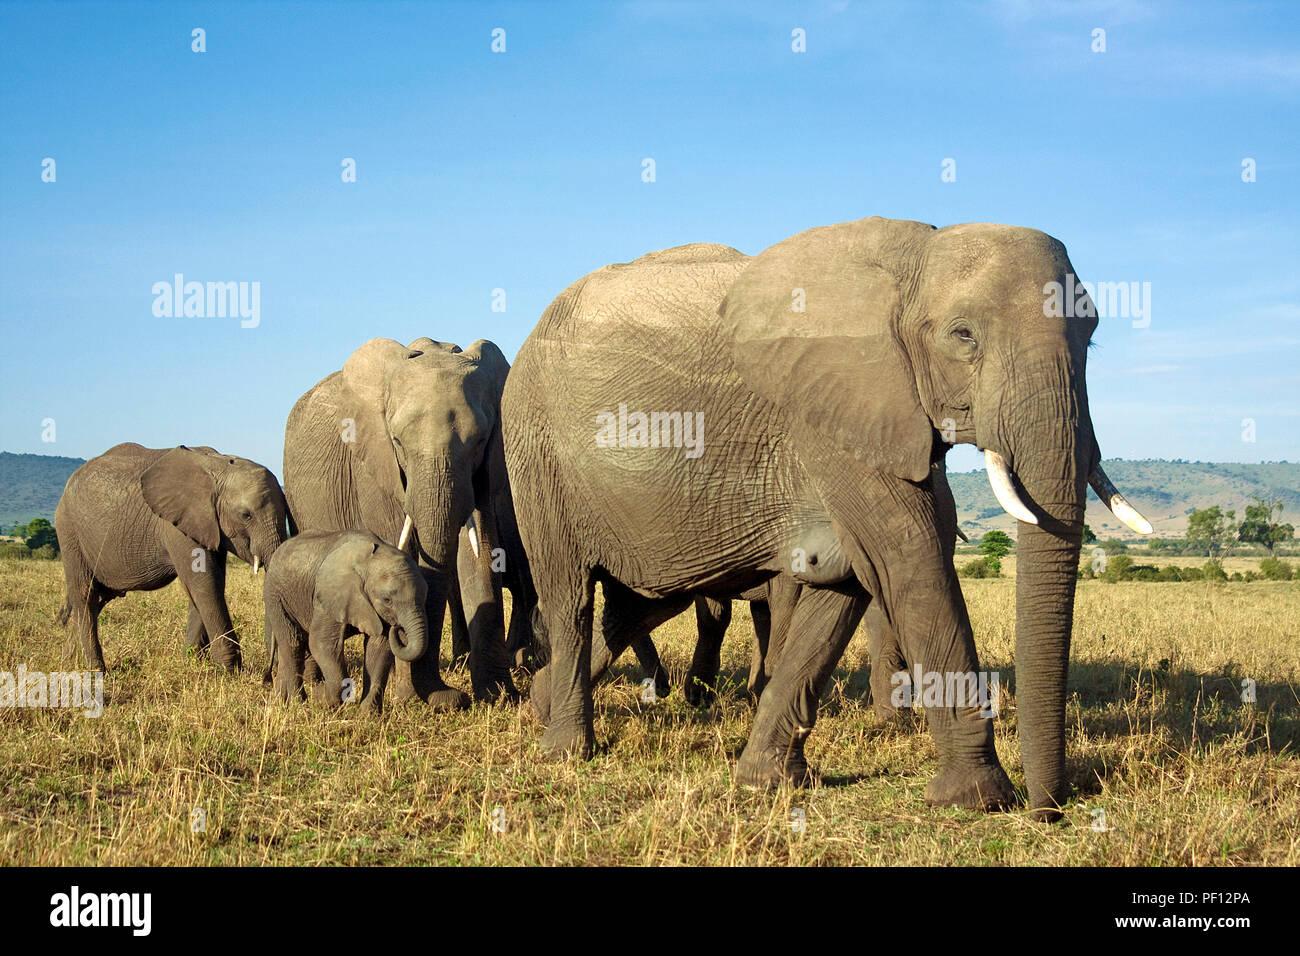 African bush elephant or African elephant (Loxodonta africana) herd at Samburu, Kenya - Stock Image